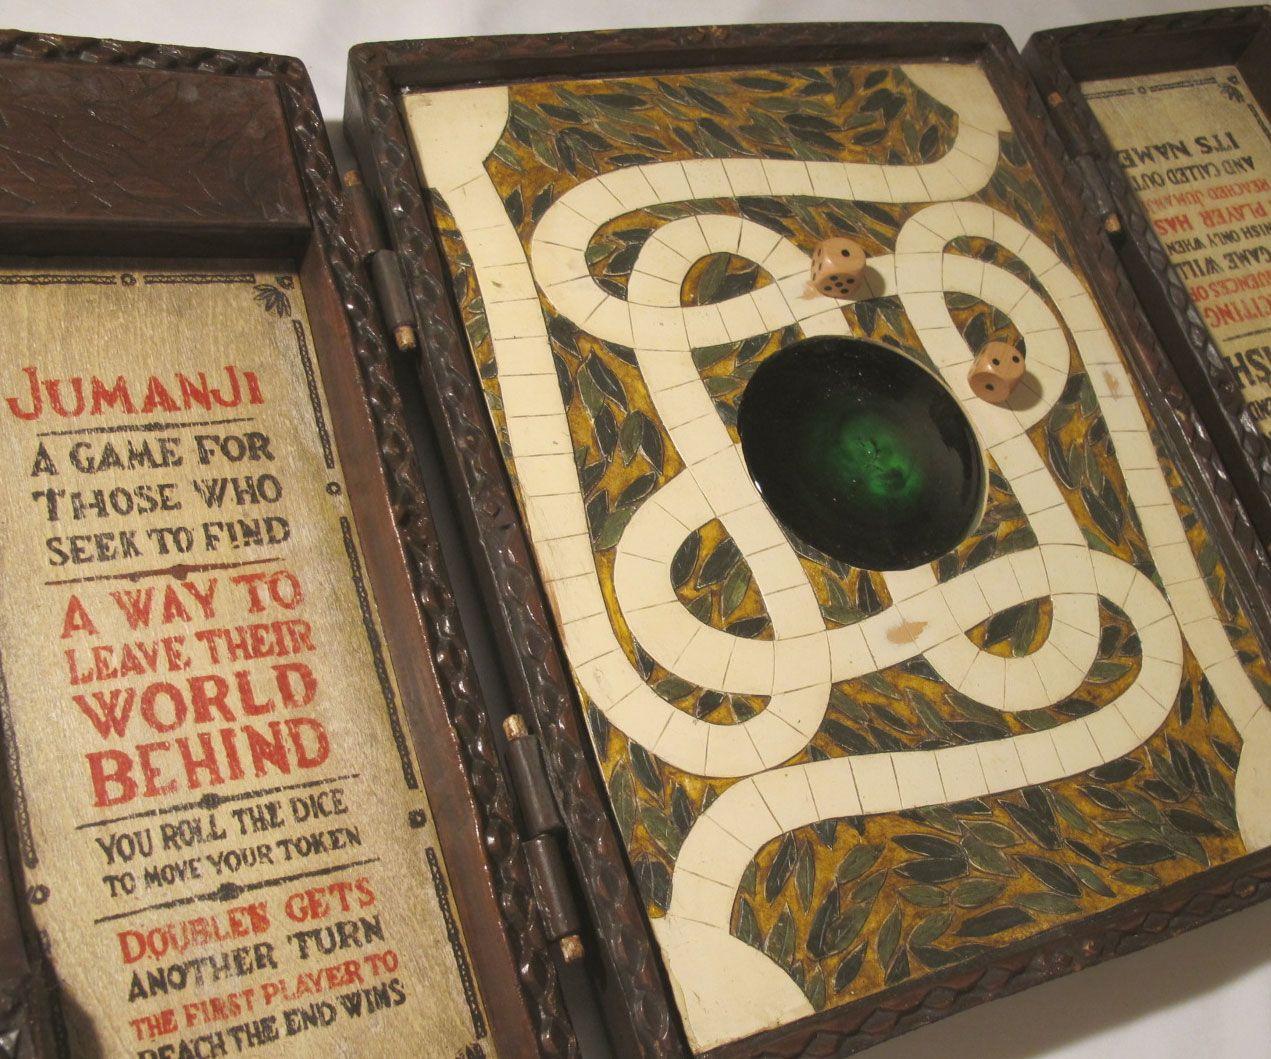 Jumanji Board Game Replica Jumanji board game and Board